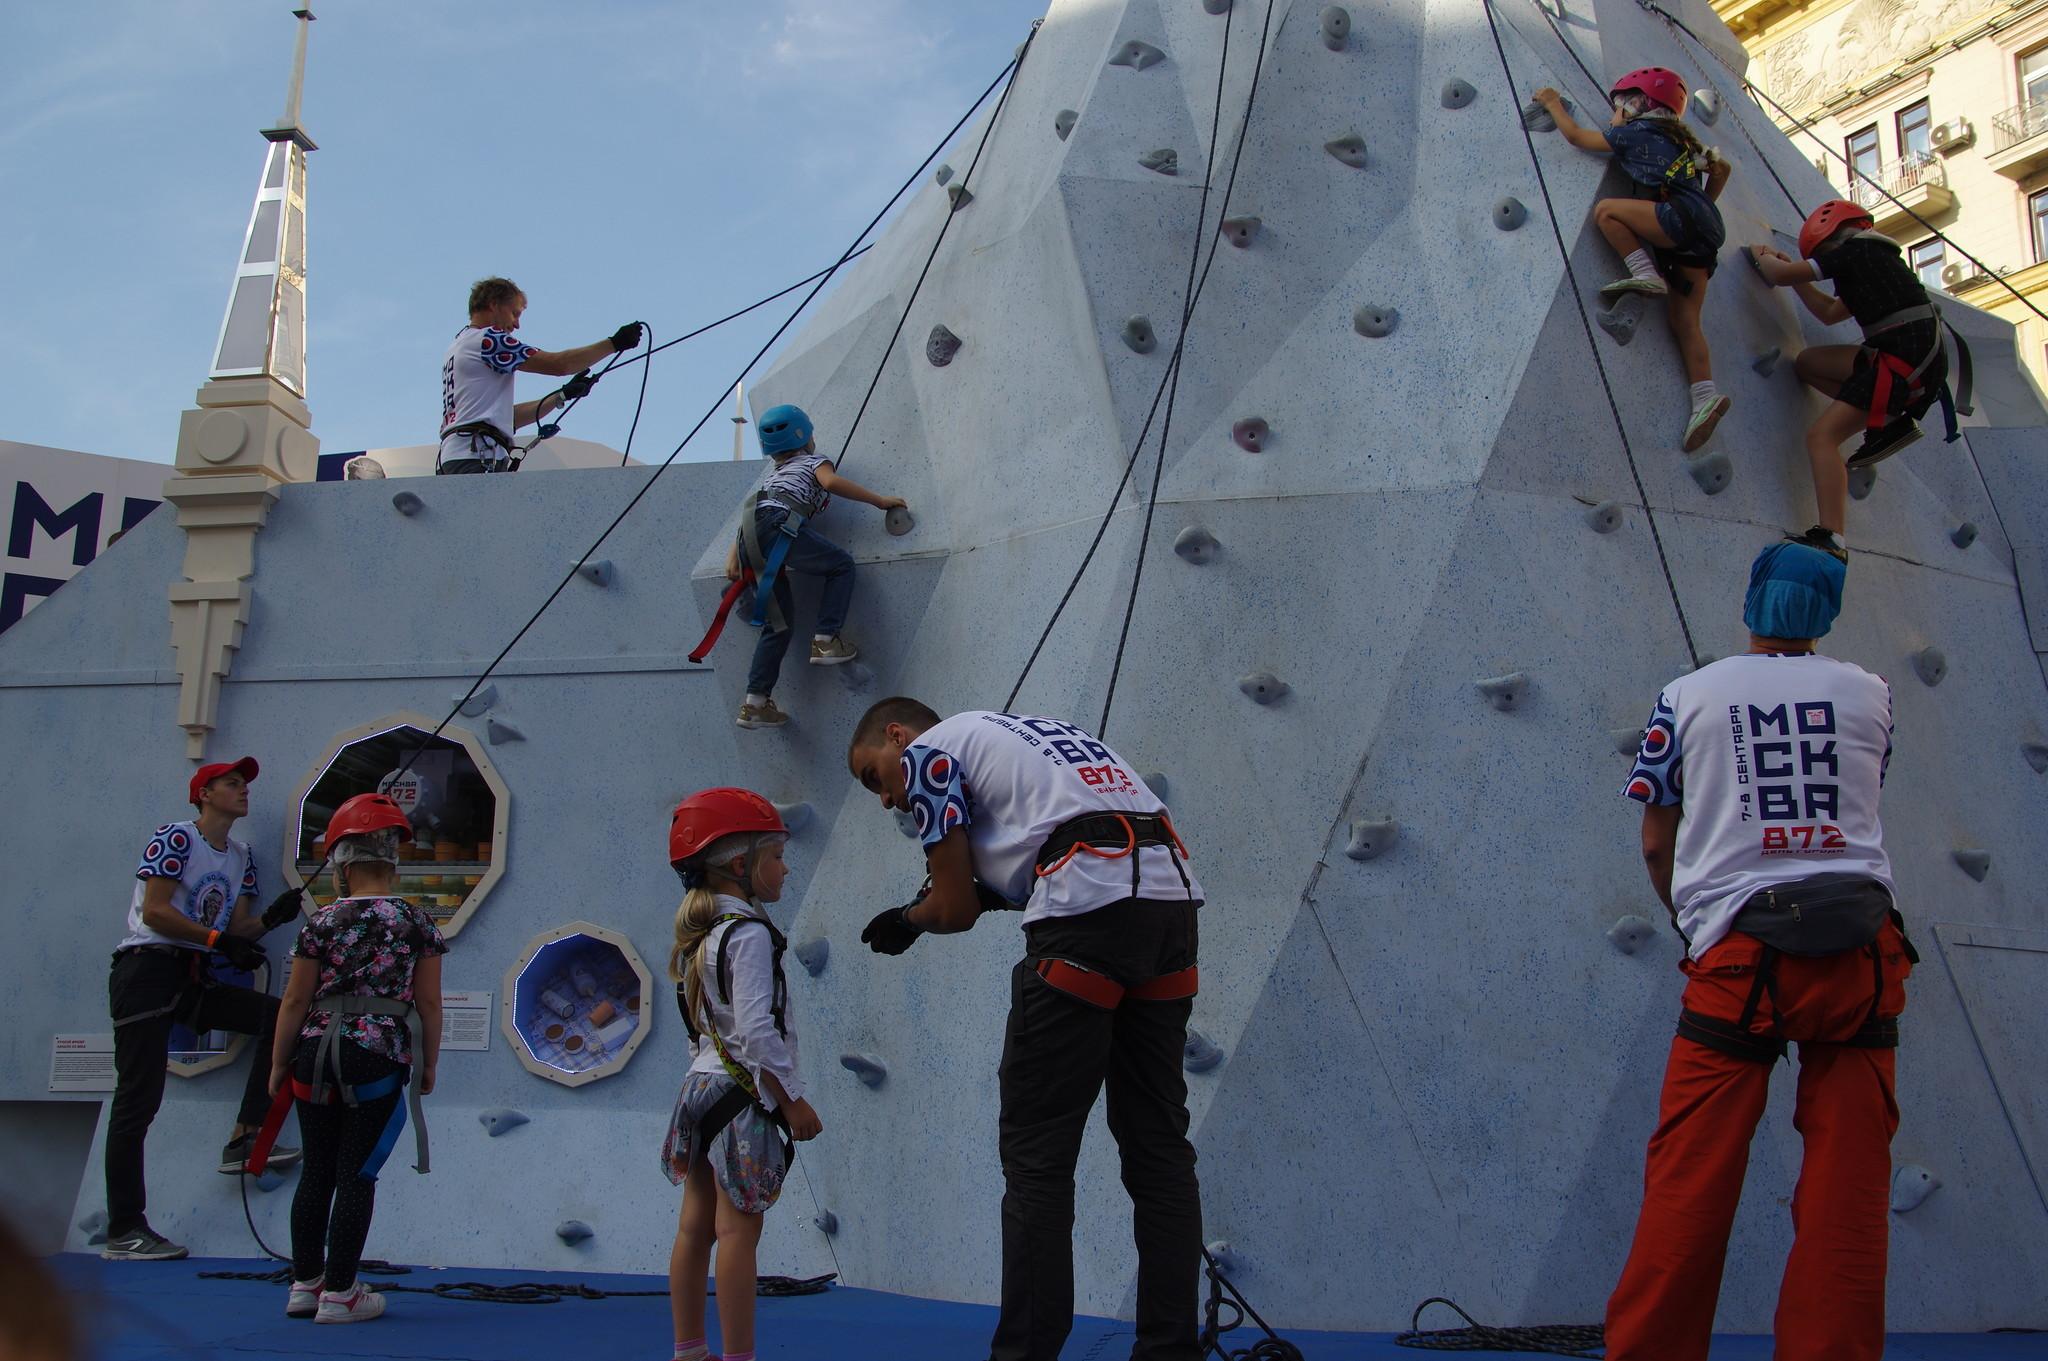 Тренировка на скалодроме